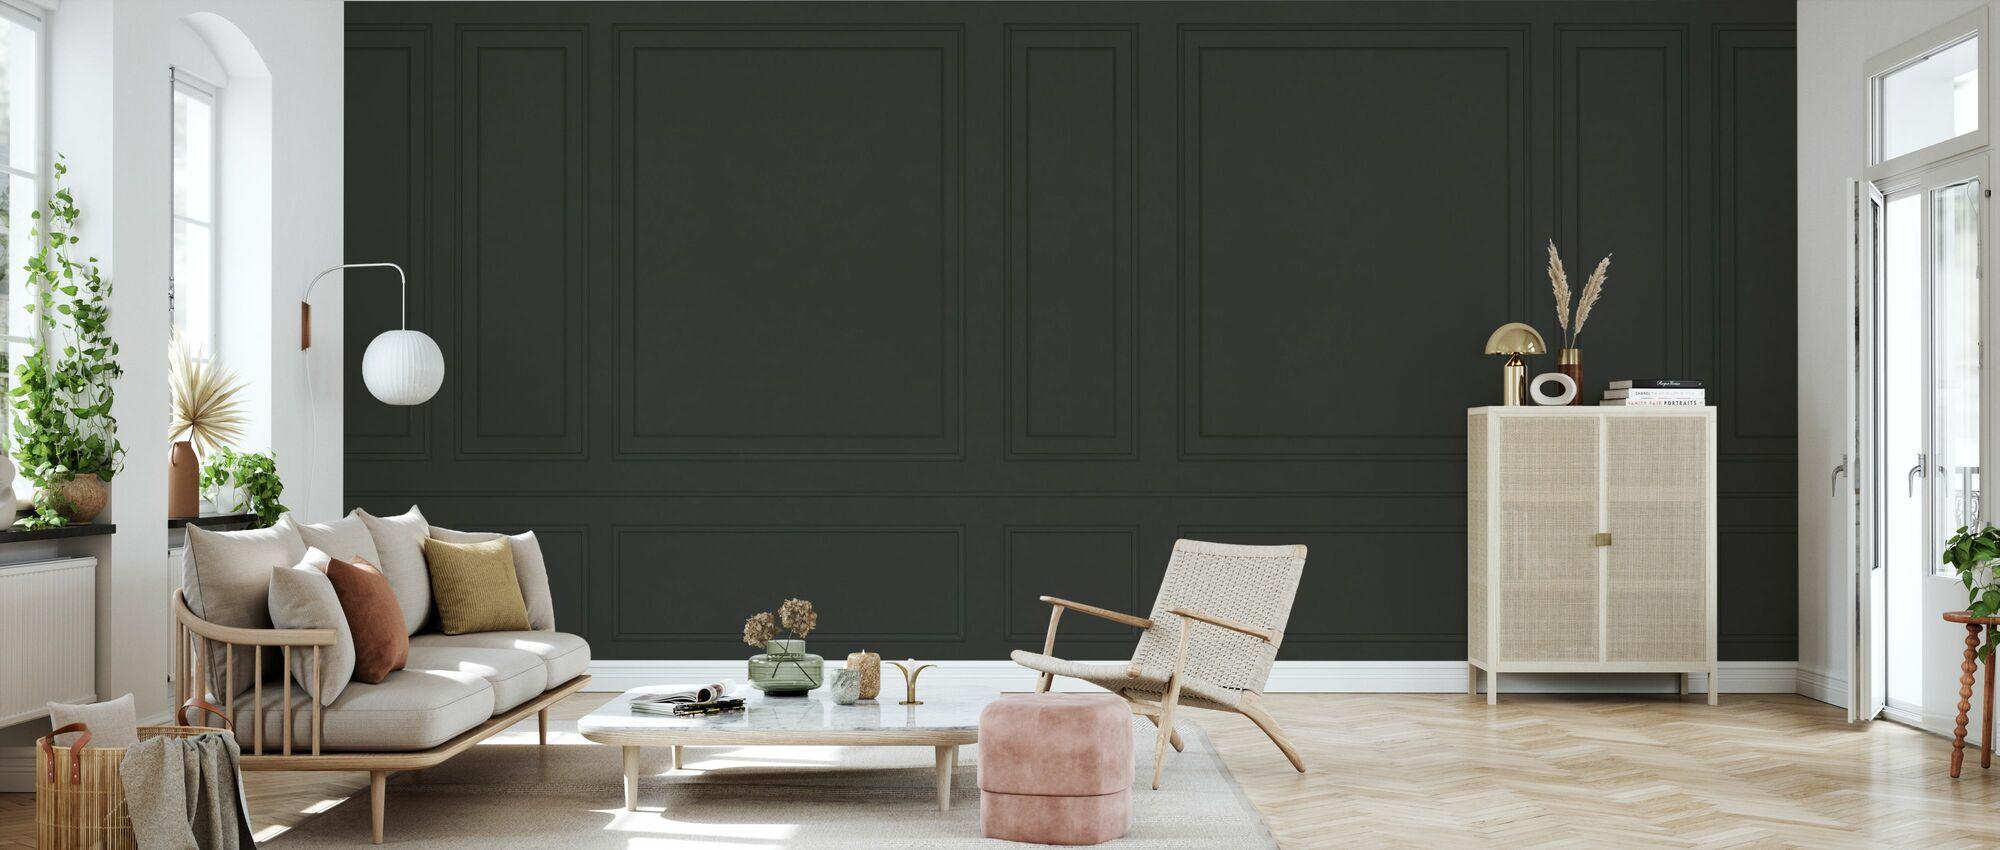 Voguish Wall Panel - Green - Wallpaper - Living Room